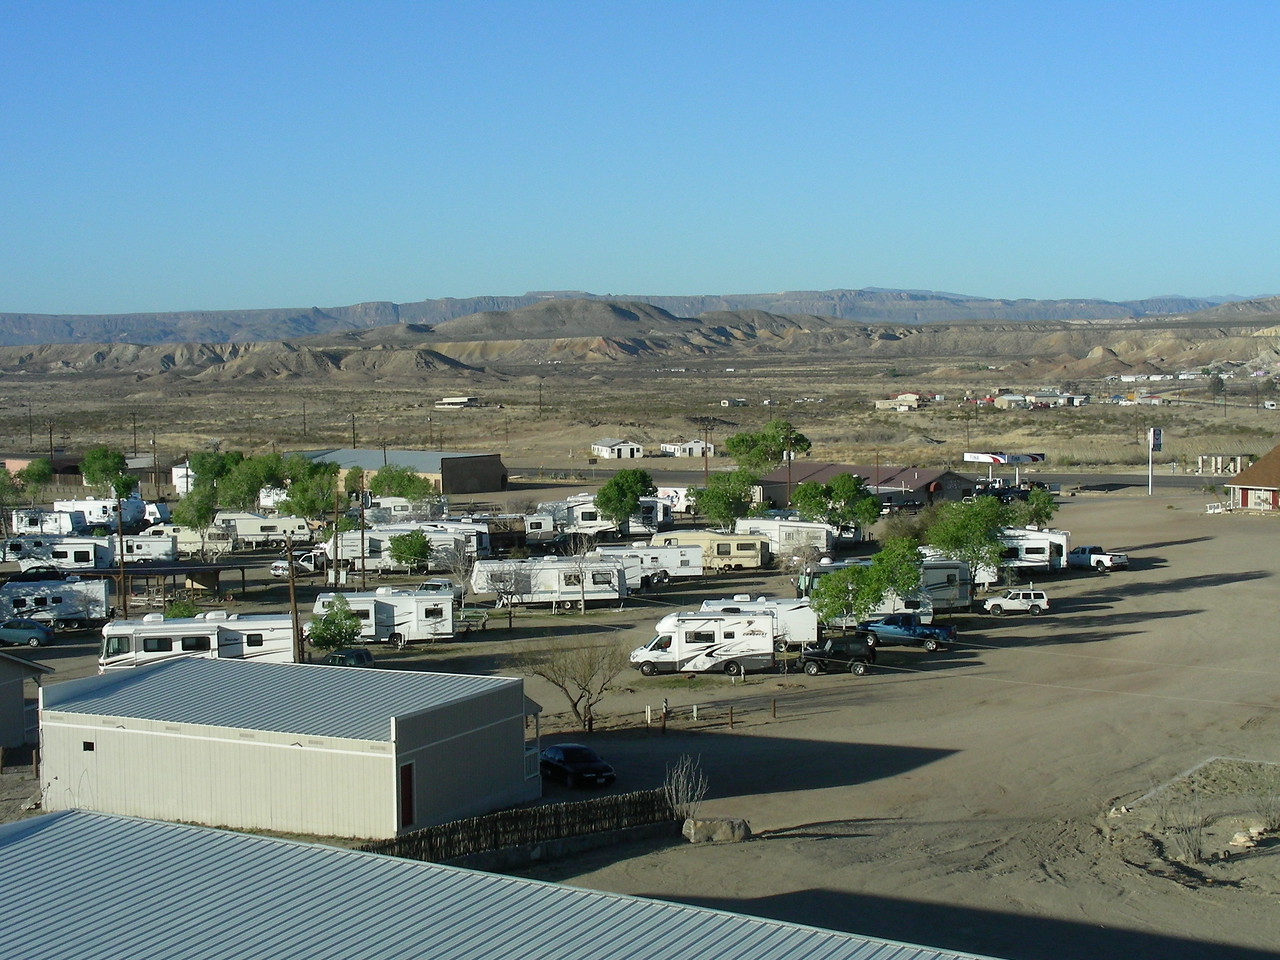 Morning view of Big Bend RV Park, Terlingua, Texas  | 3/8/2010